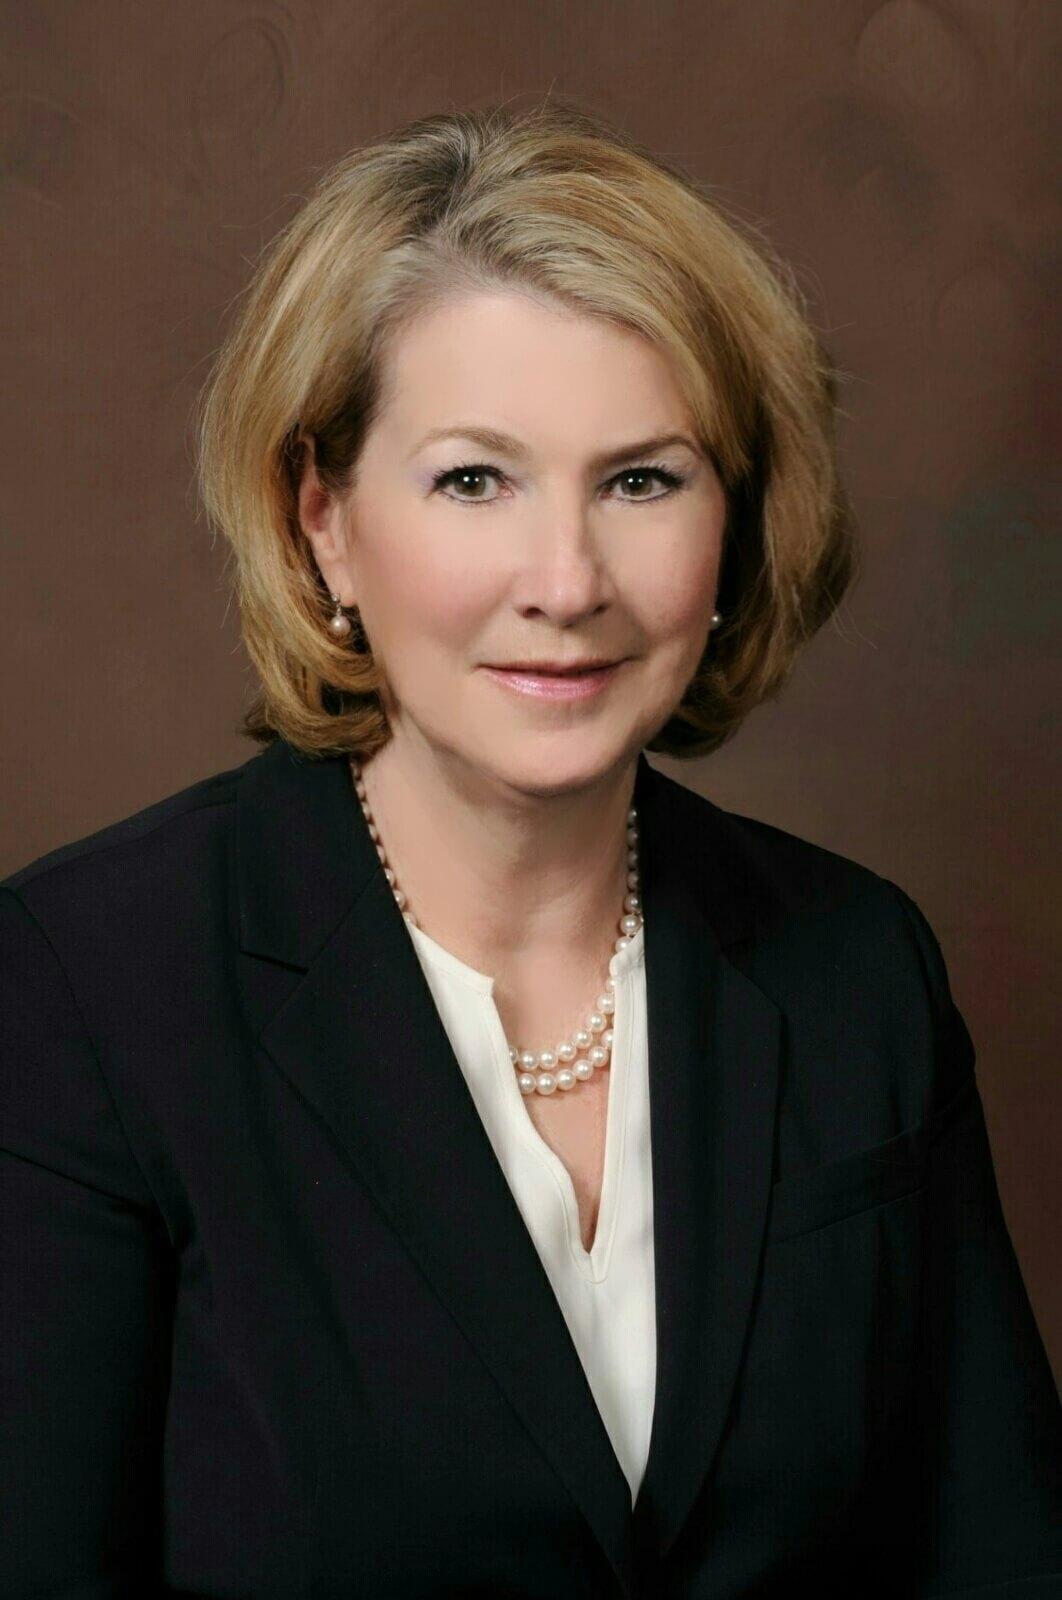 Lousie Monaghan personal injury civil litigation attorney uniontown pa